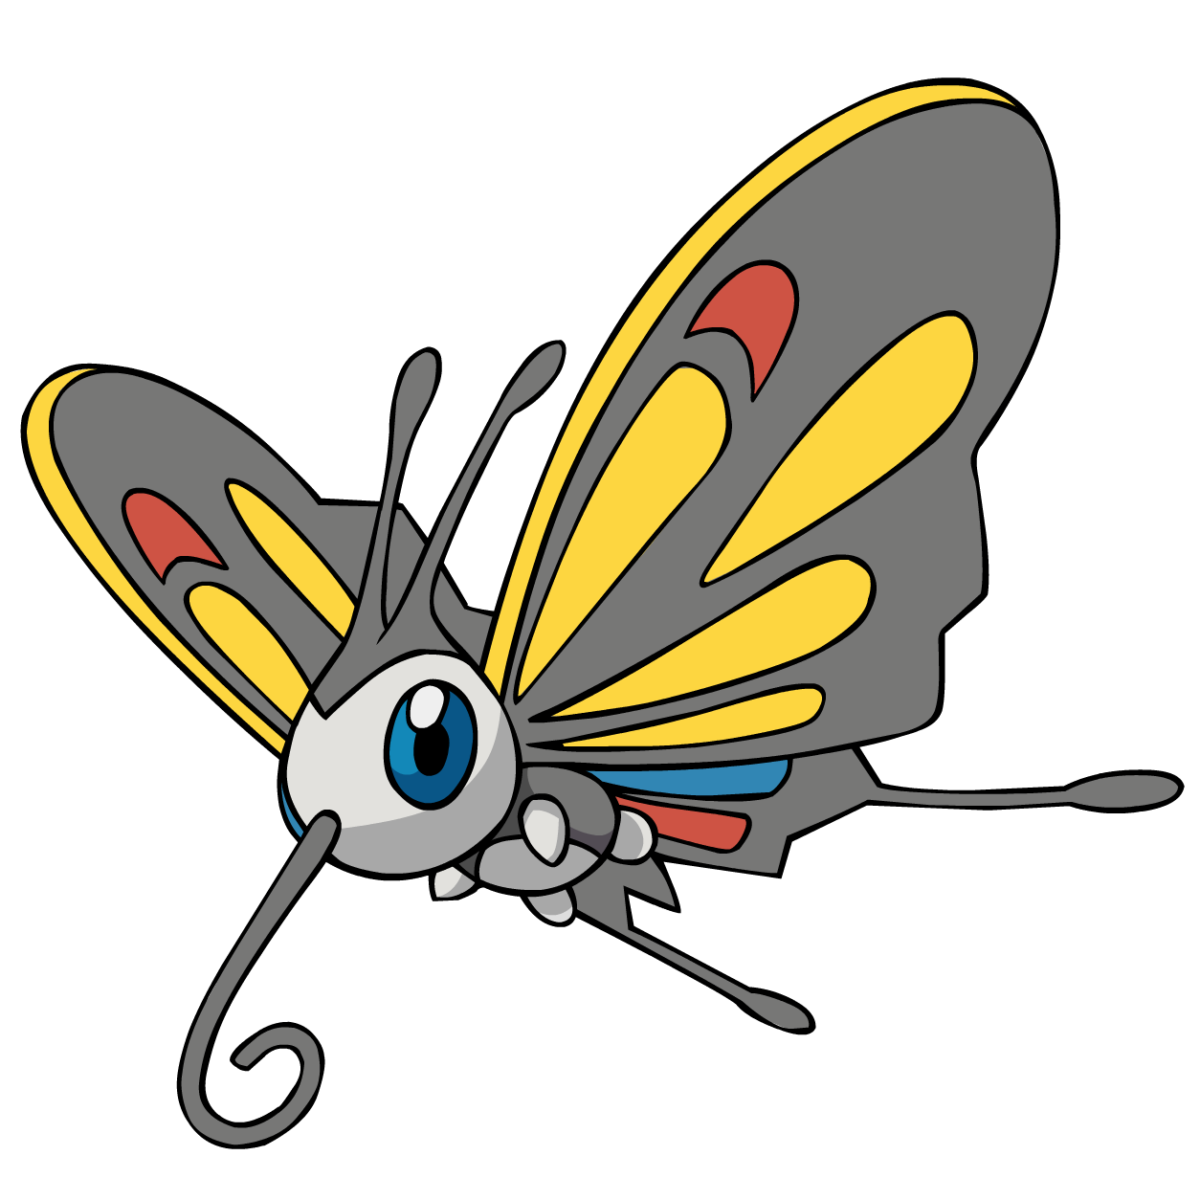 beautifly #pokemon #anime #pocketmonsters | Pokemon Games & Anime …